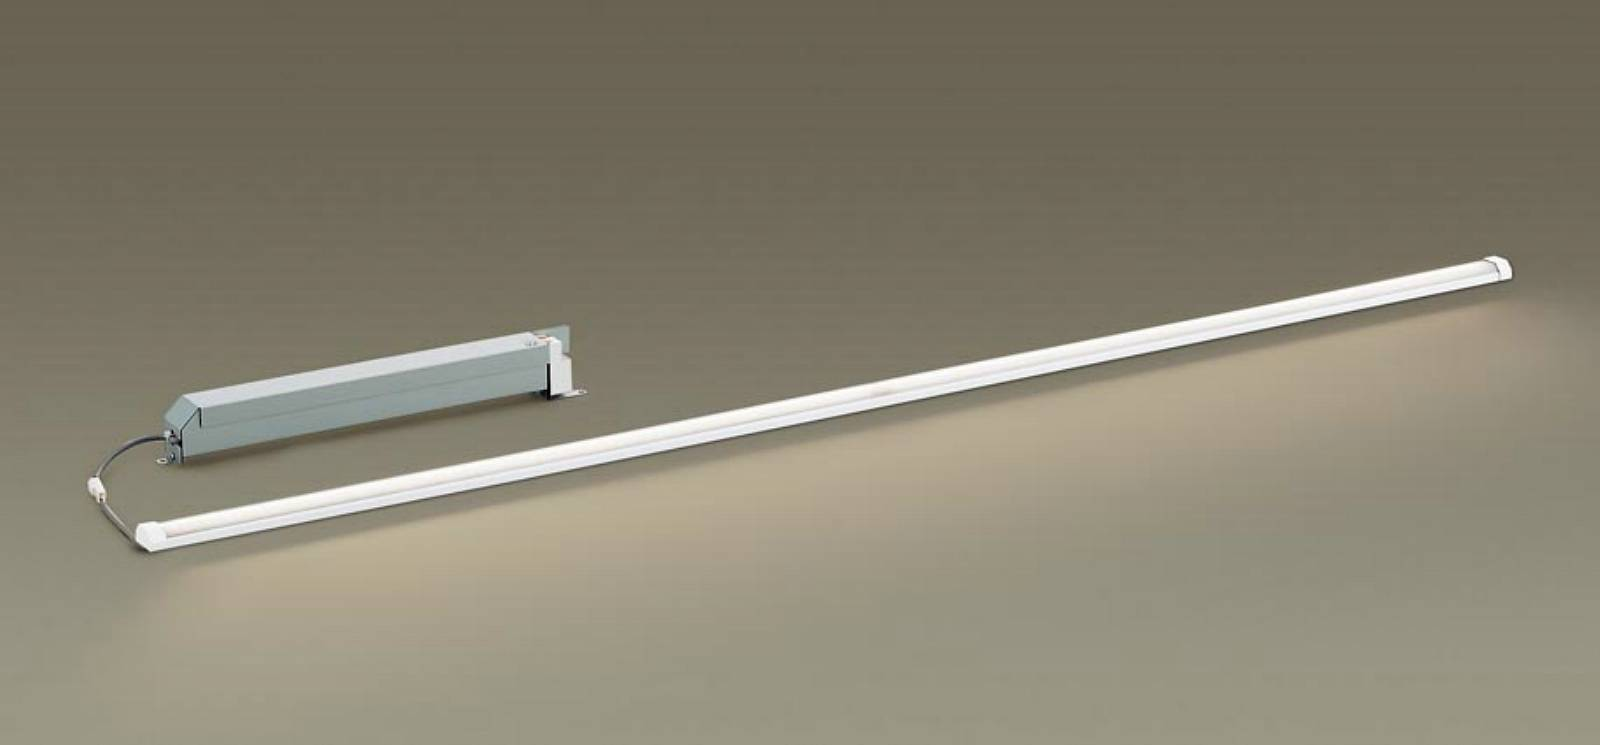 T区分 パナソニック LGB50431KLB1 ベースライト 建築化照明器具 畳数設定無し LED【setsuden_led】